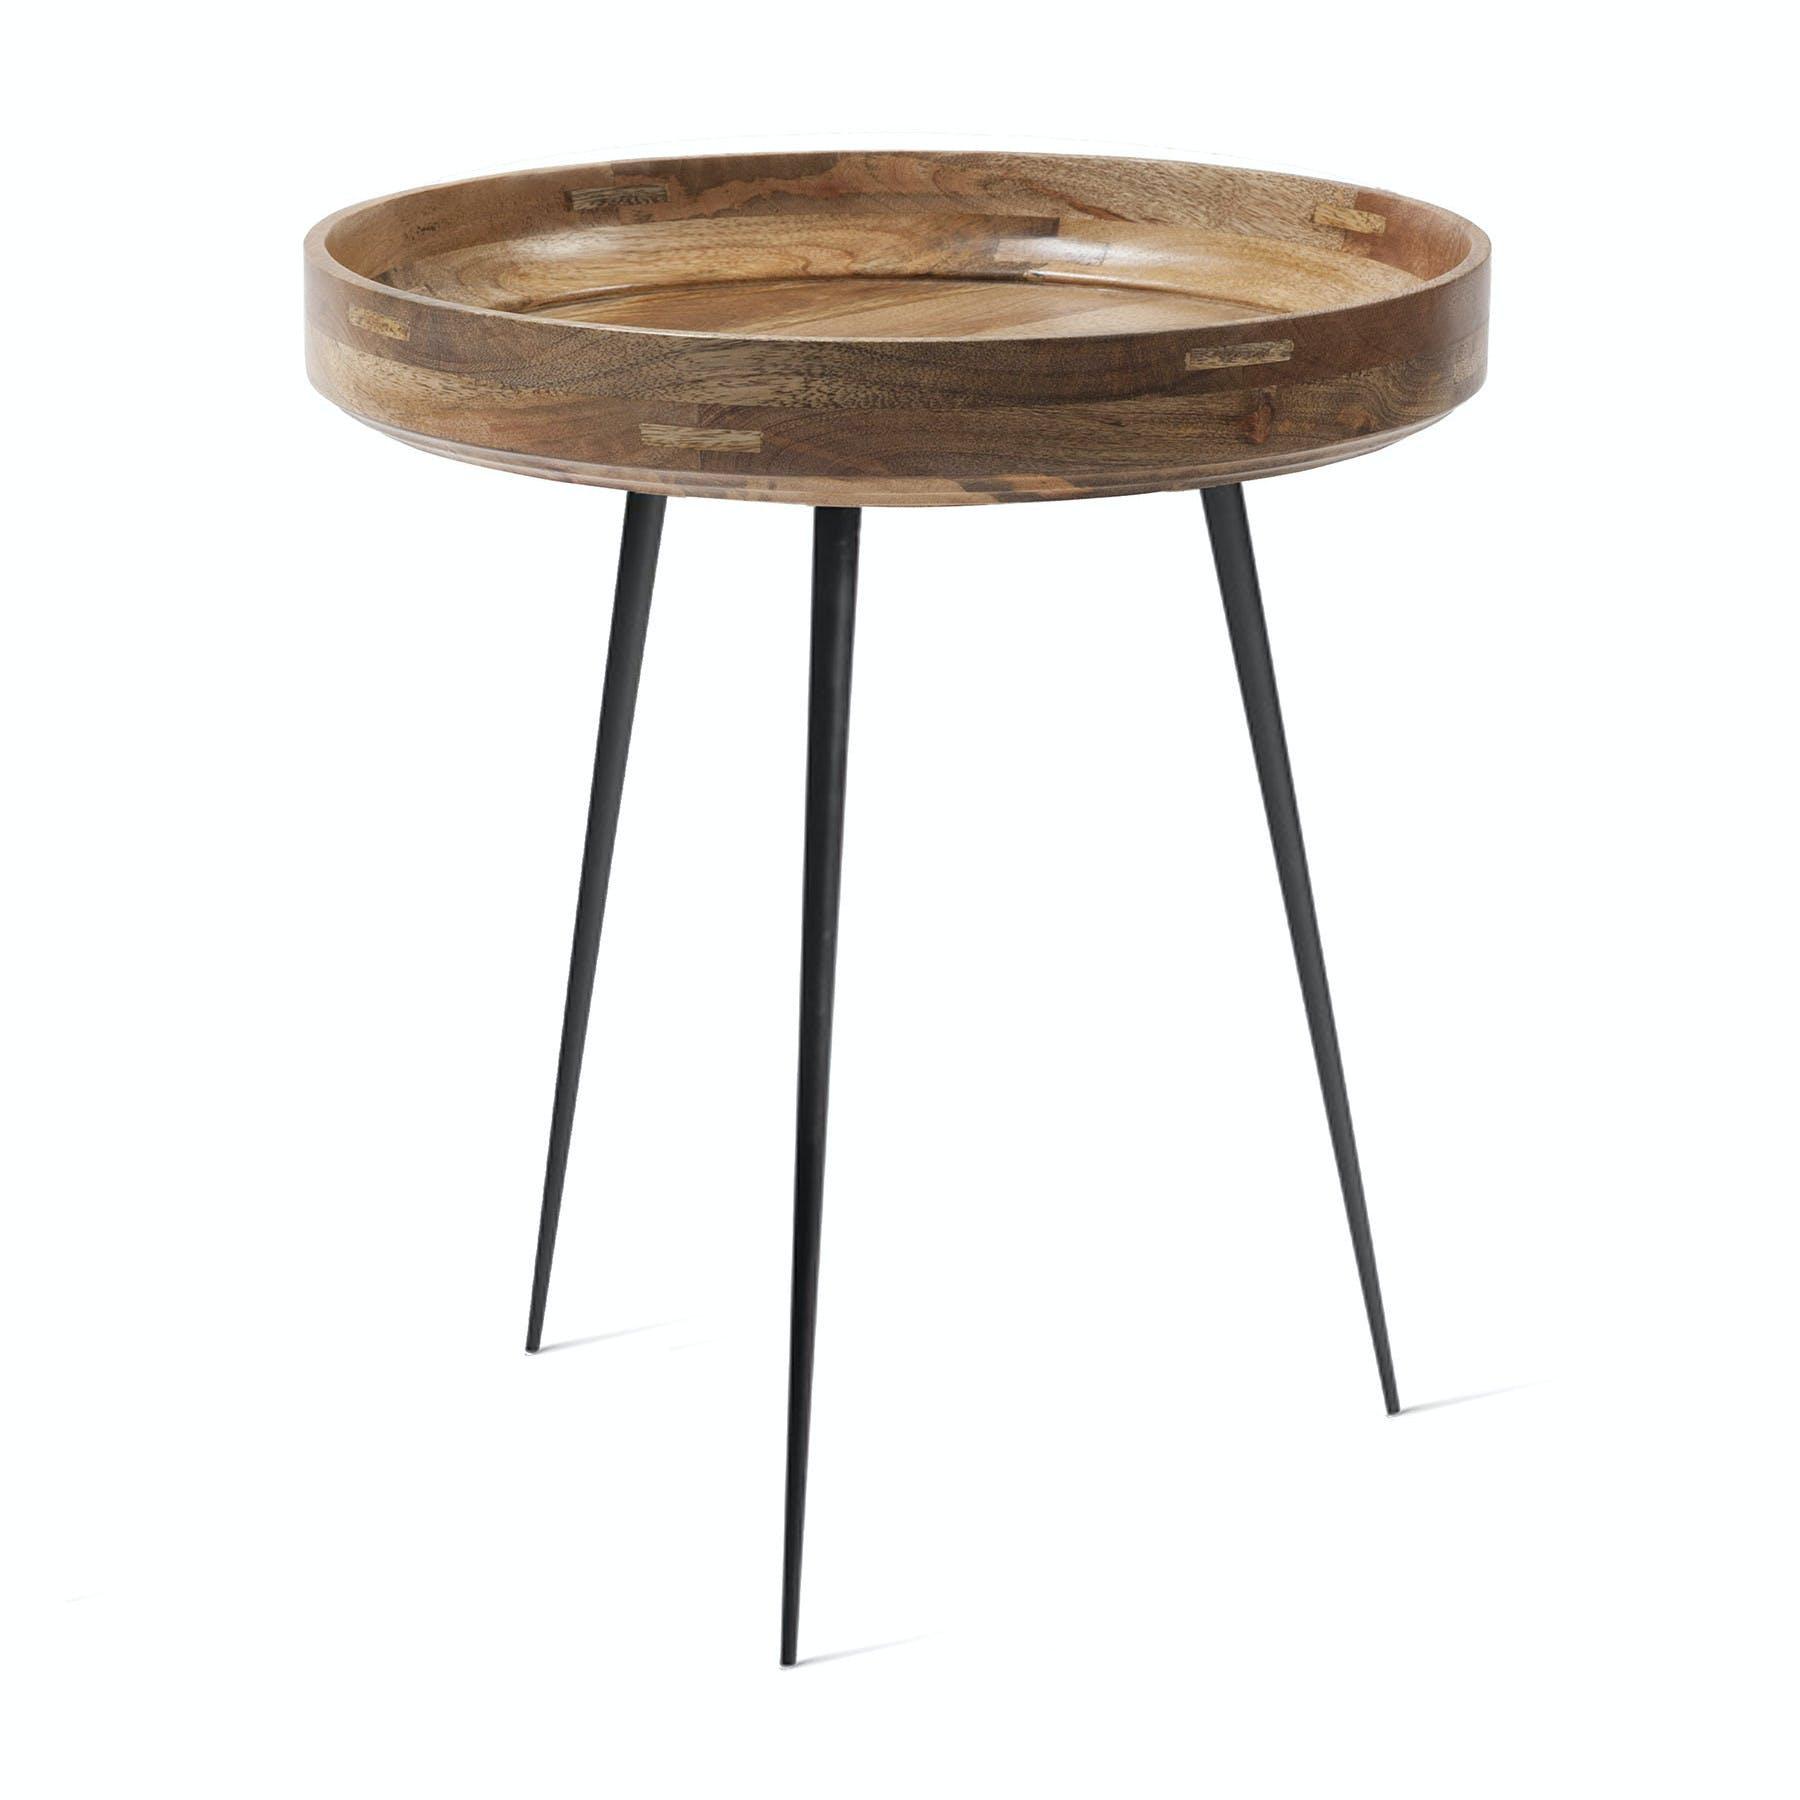 Mater Natural Medium Bowl Table Haute Living